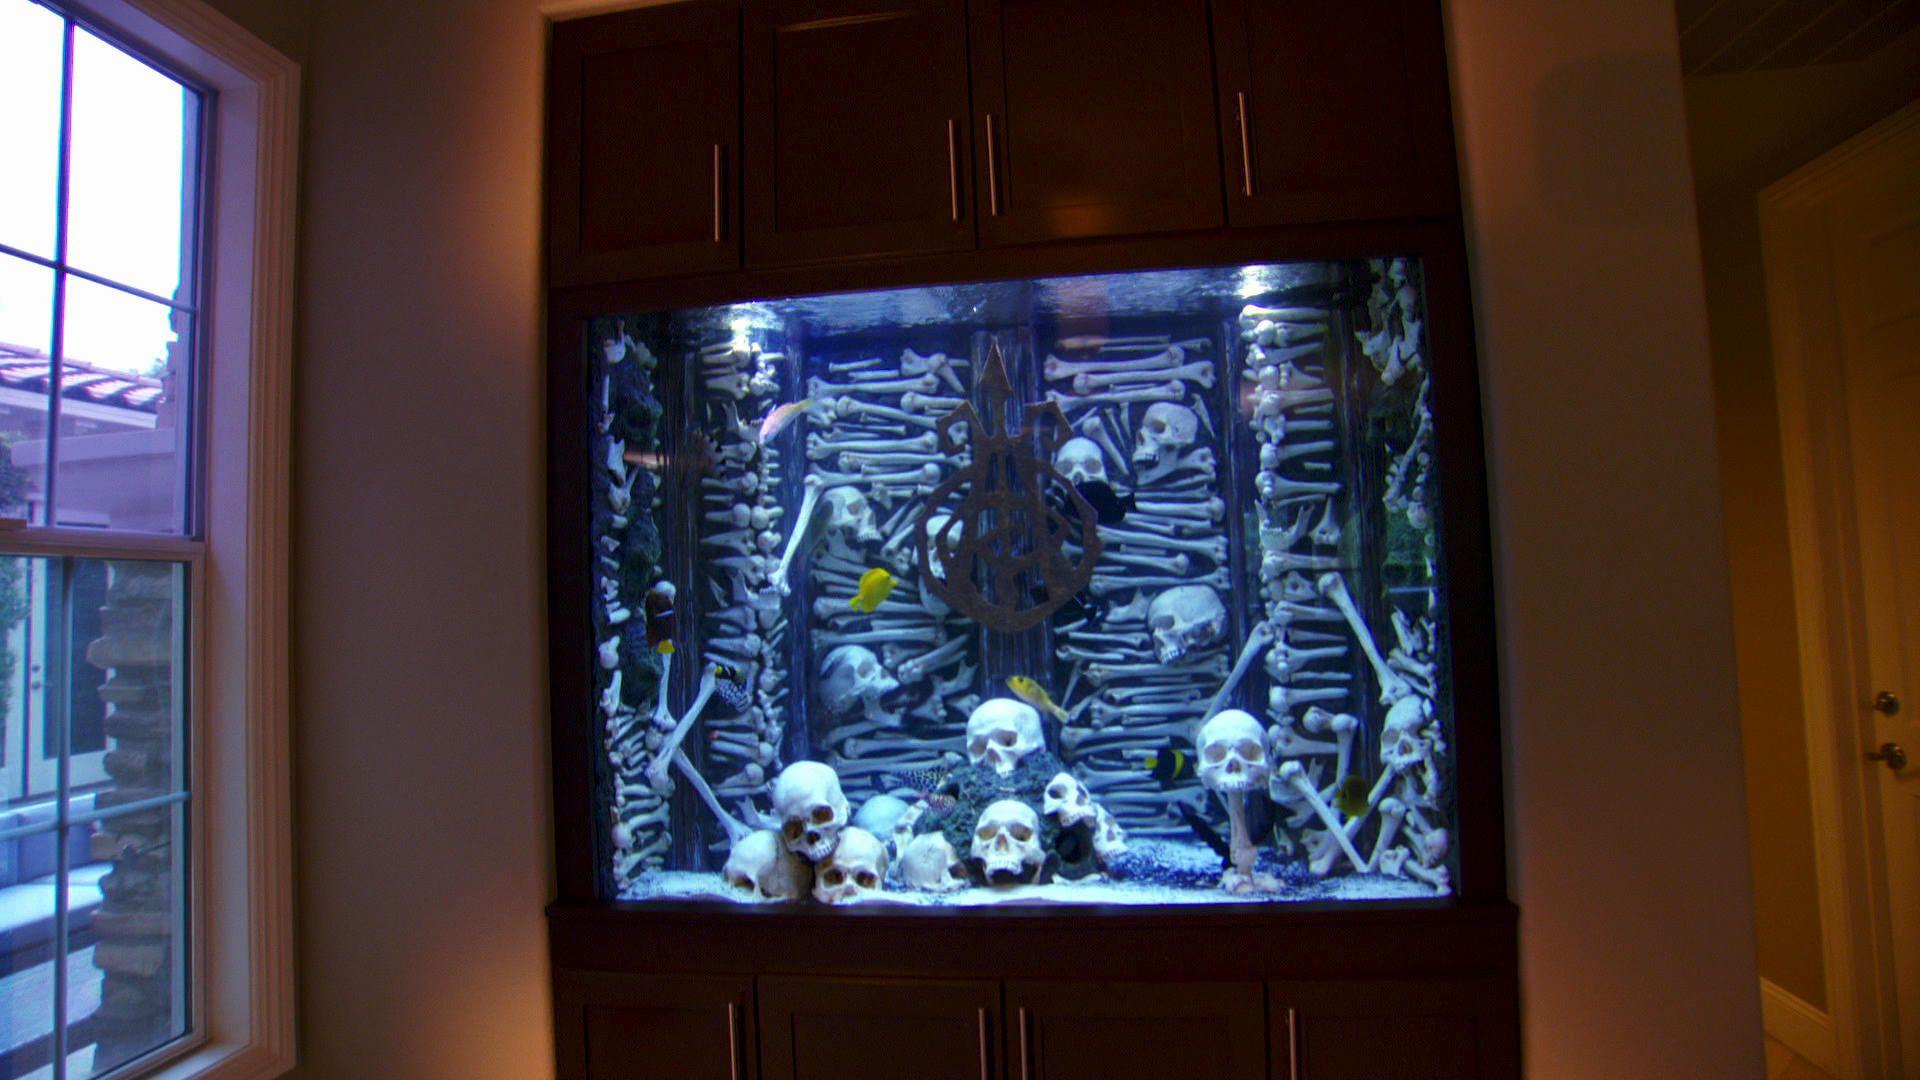 Gothic fish tank